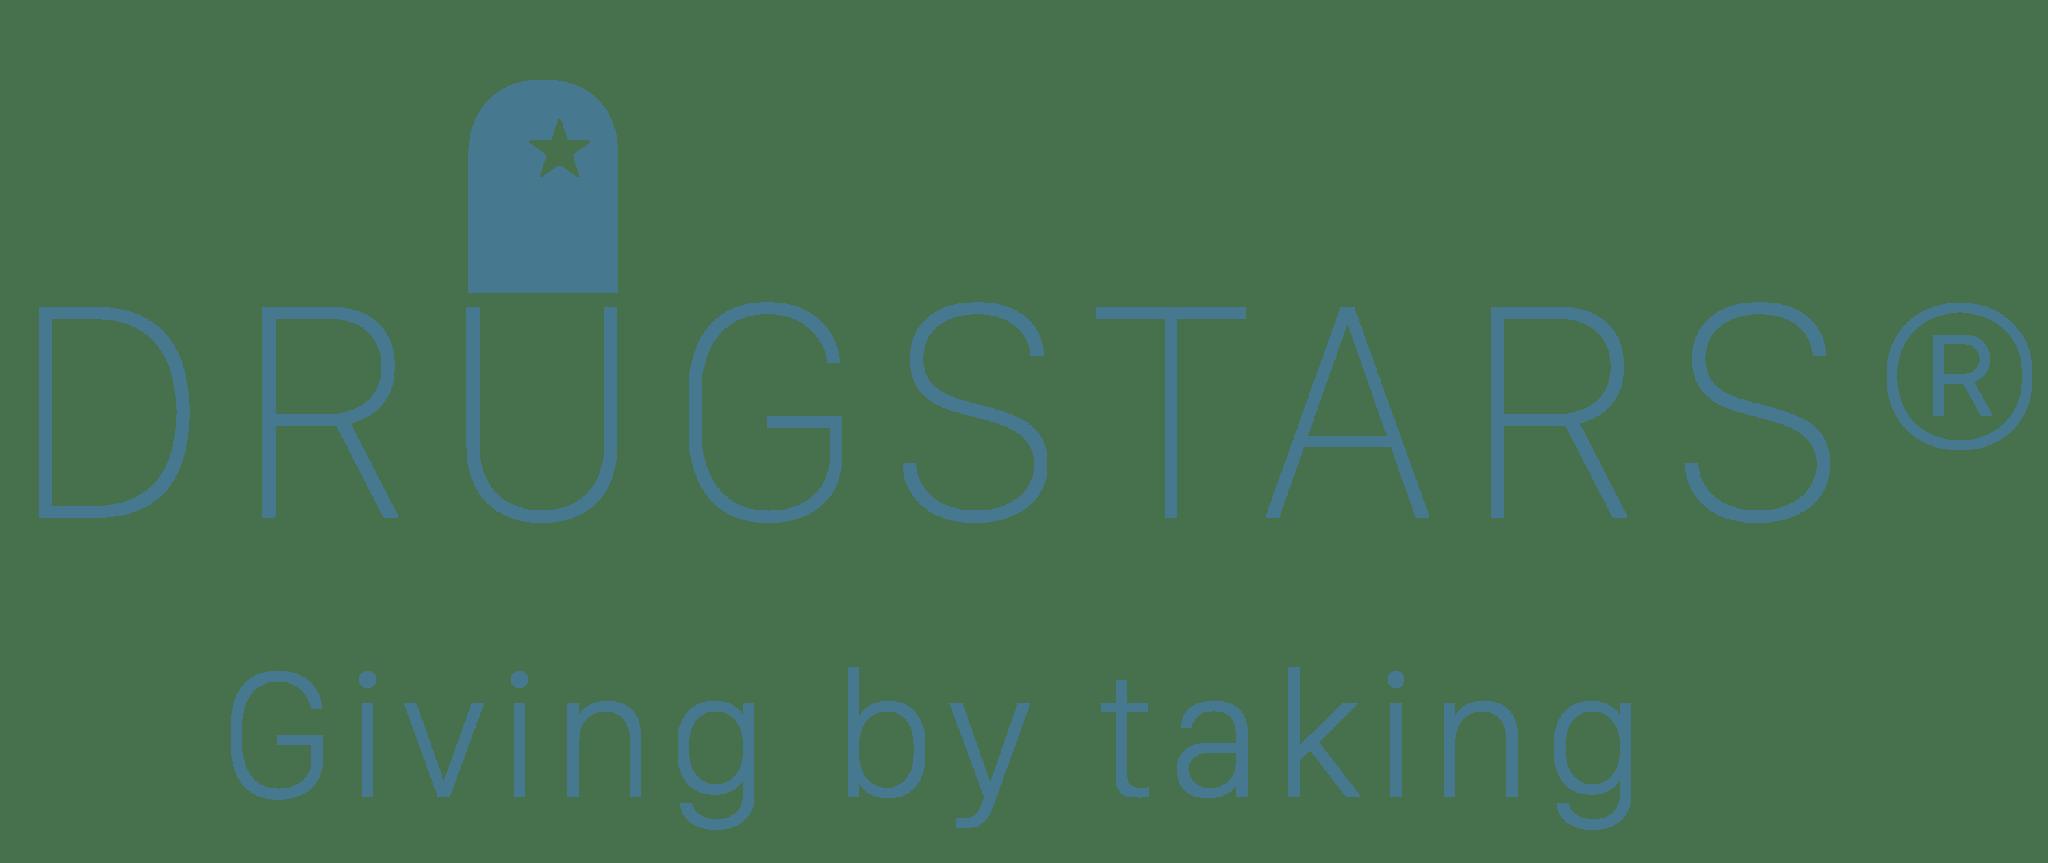 Drugstars